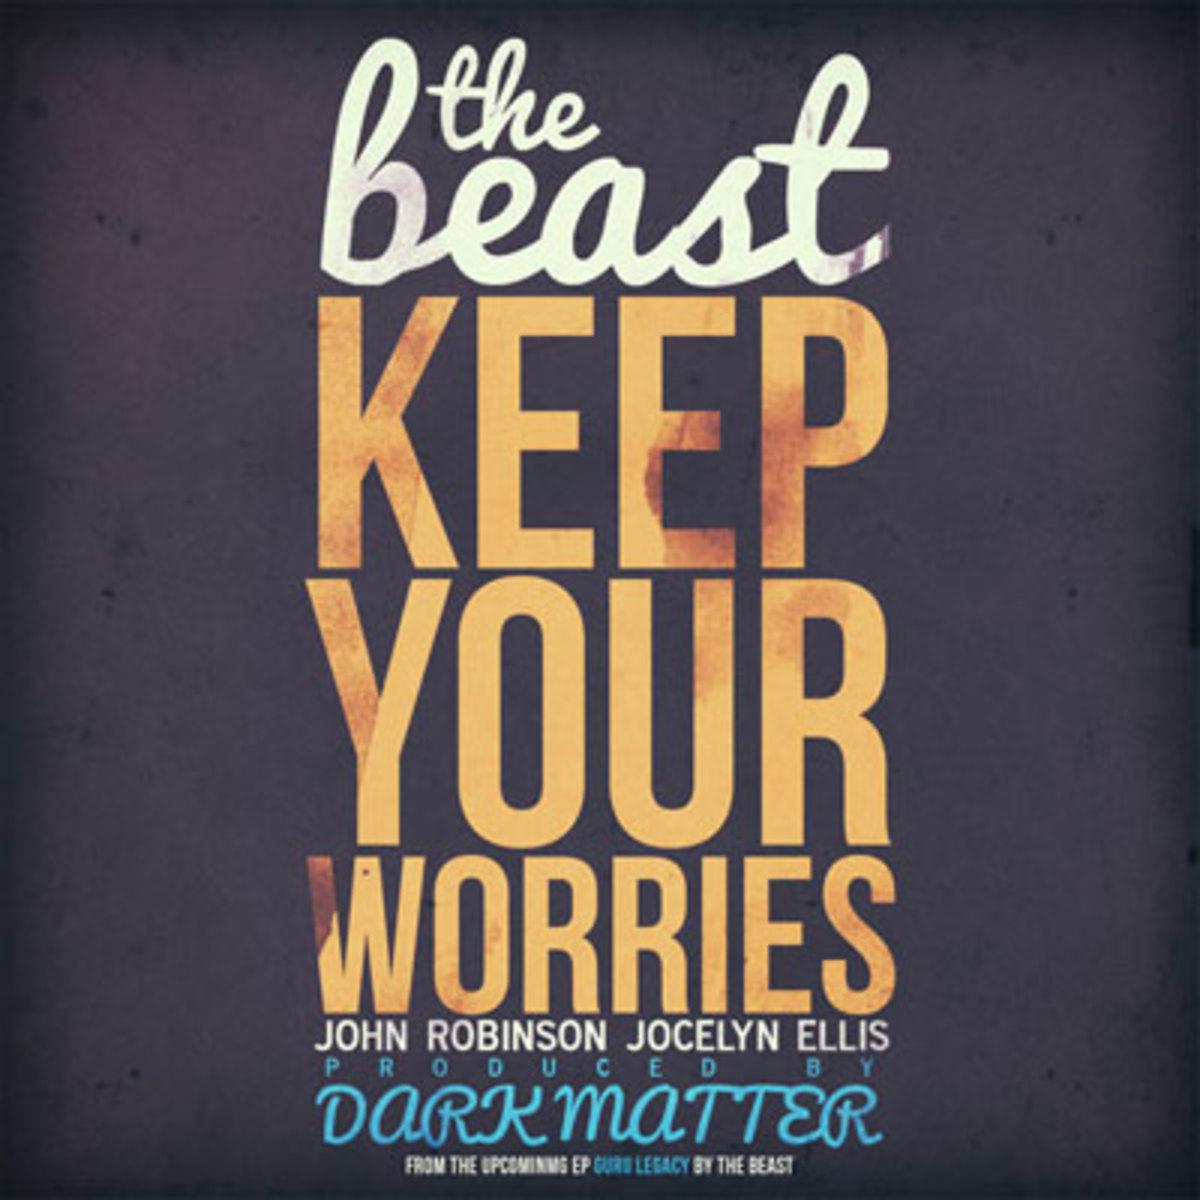 thebeast-keepyourworries.jpg